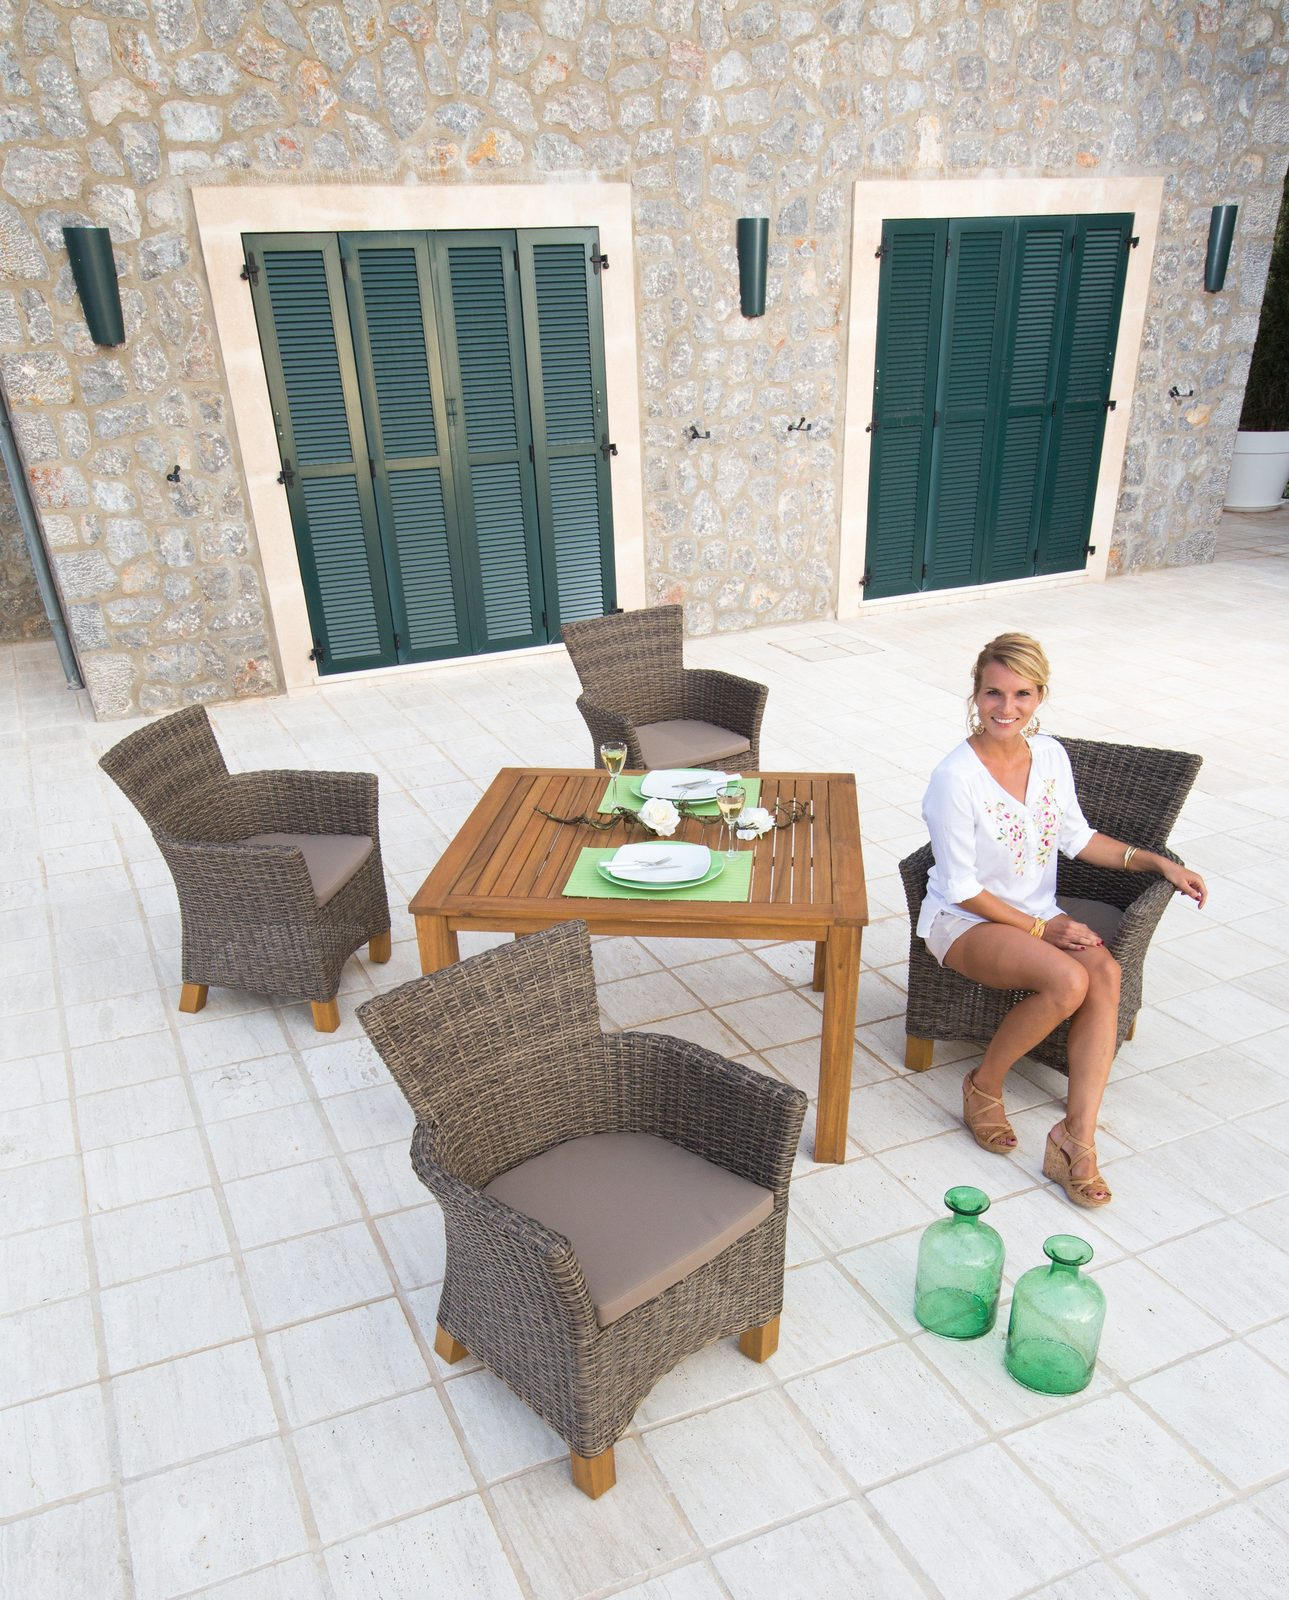 Gartenmöbelset »Toskana«, 9-tlg., 4 Sessel, Tisch 110x100 cm, Polyrattan/Akazienholz